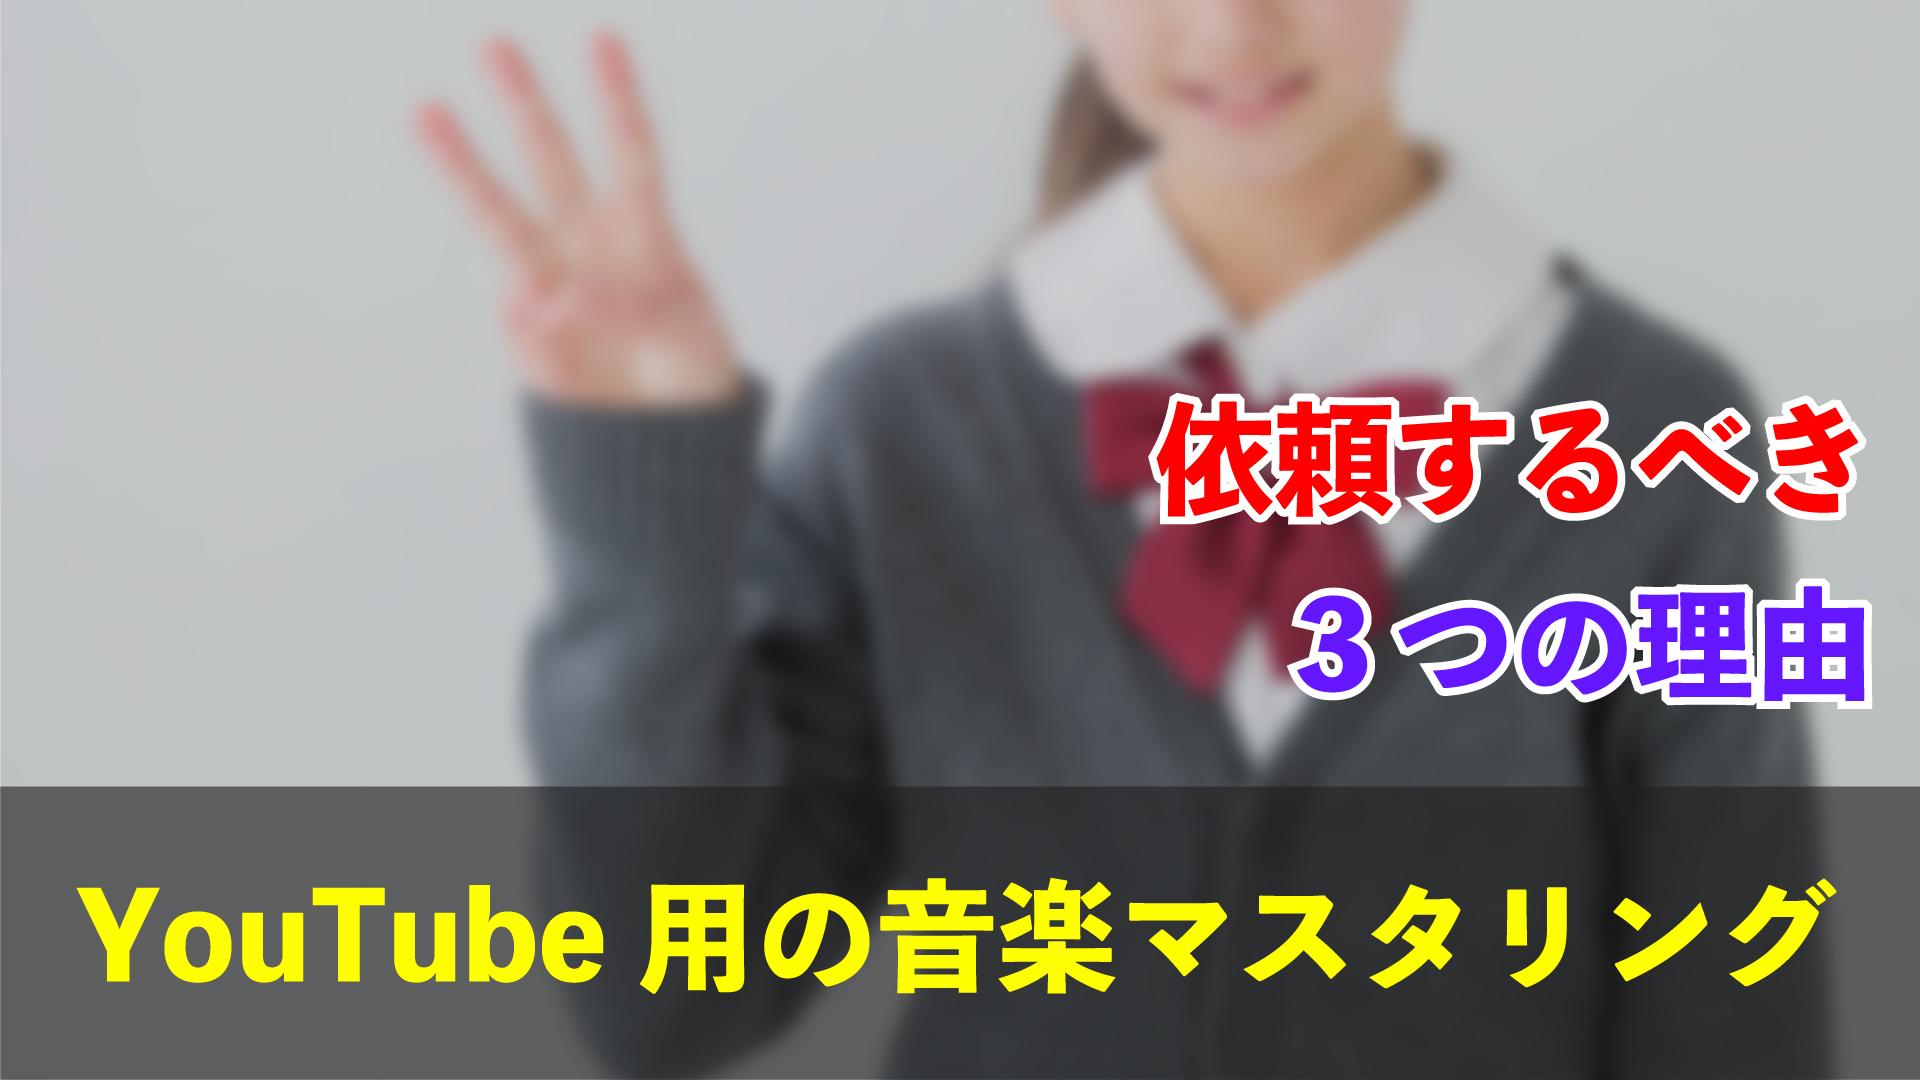 YouTube用に音楽マスタリングを依頼するべき3つの理由_thumbnail